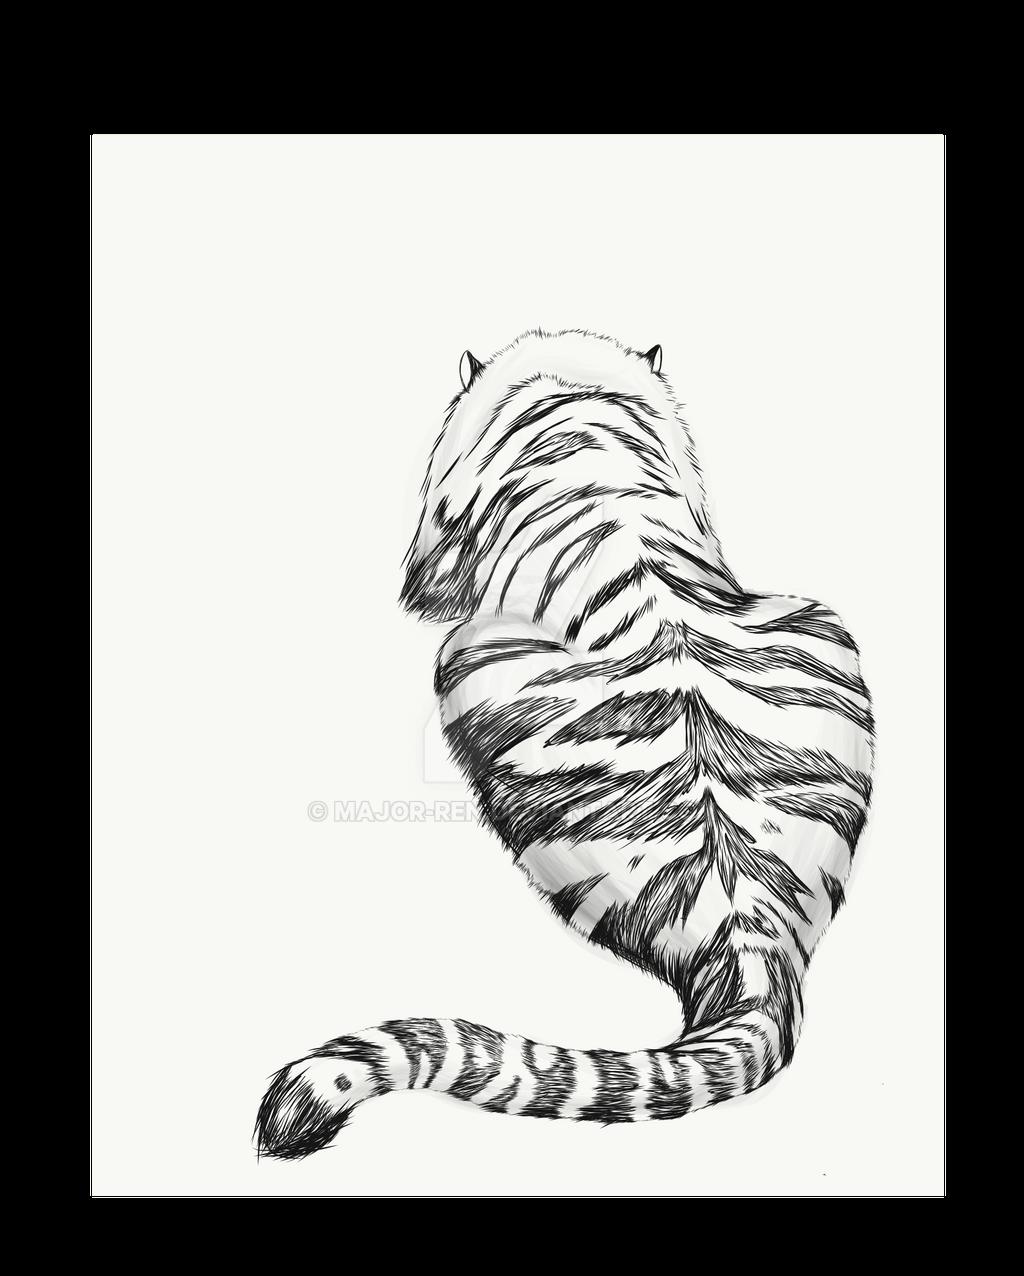 Tiger by Major-Ren